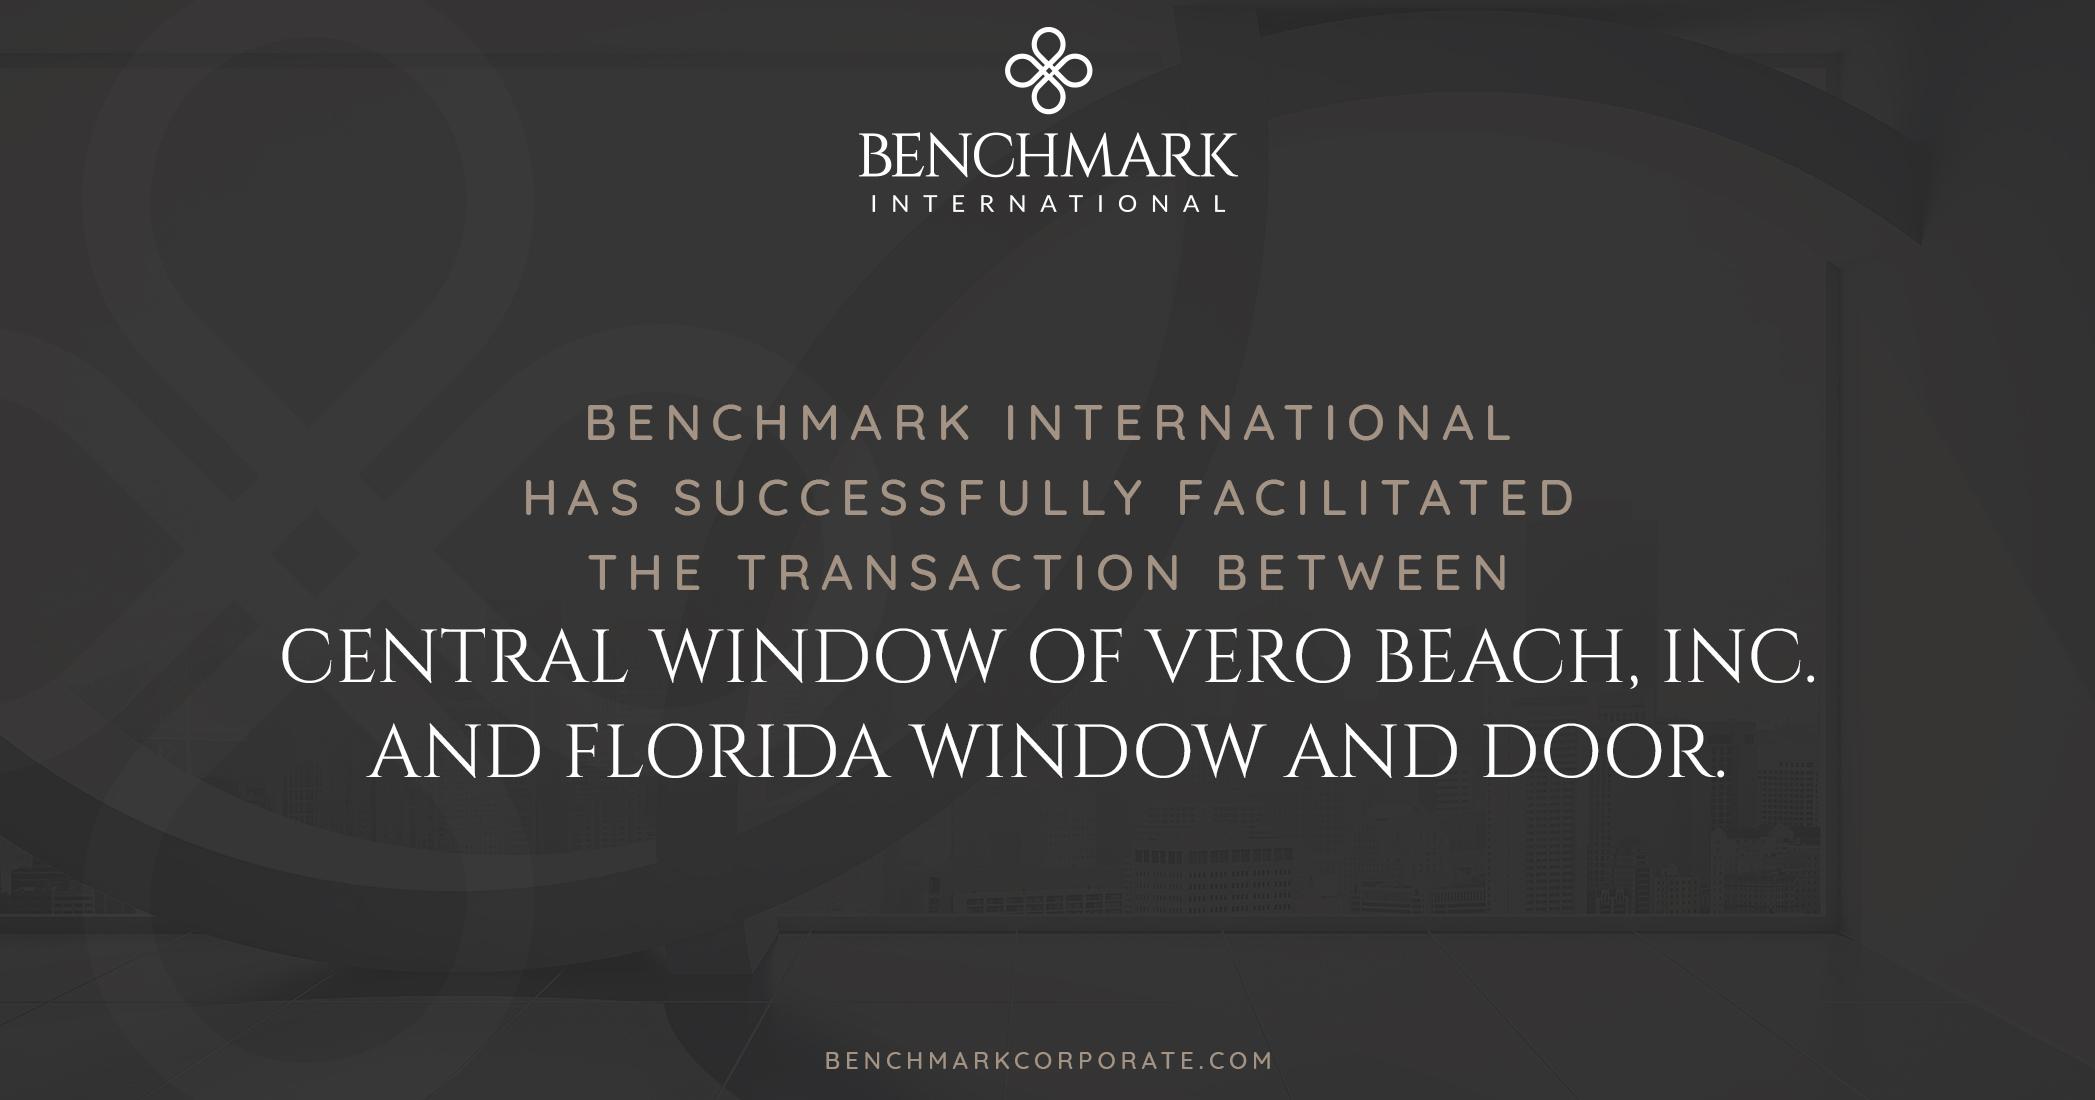 Benchmark International Has Successfully Facilitated The